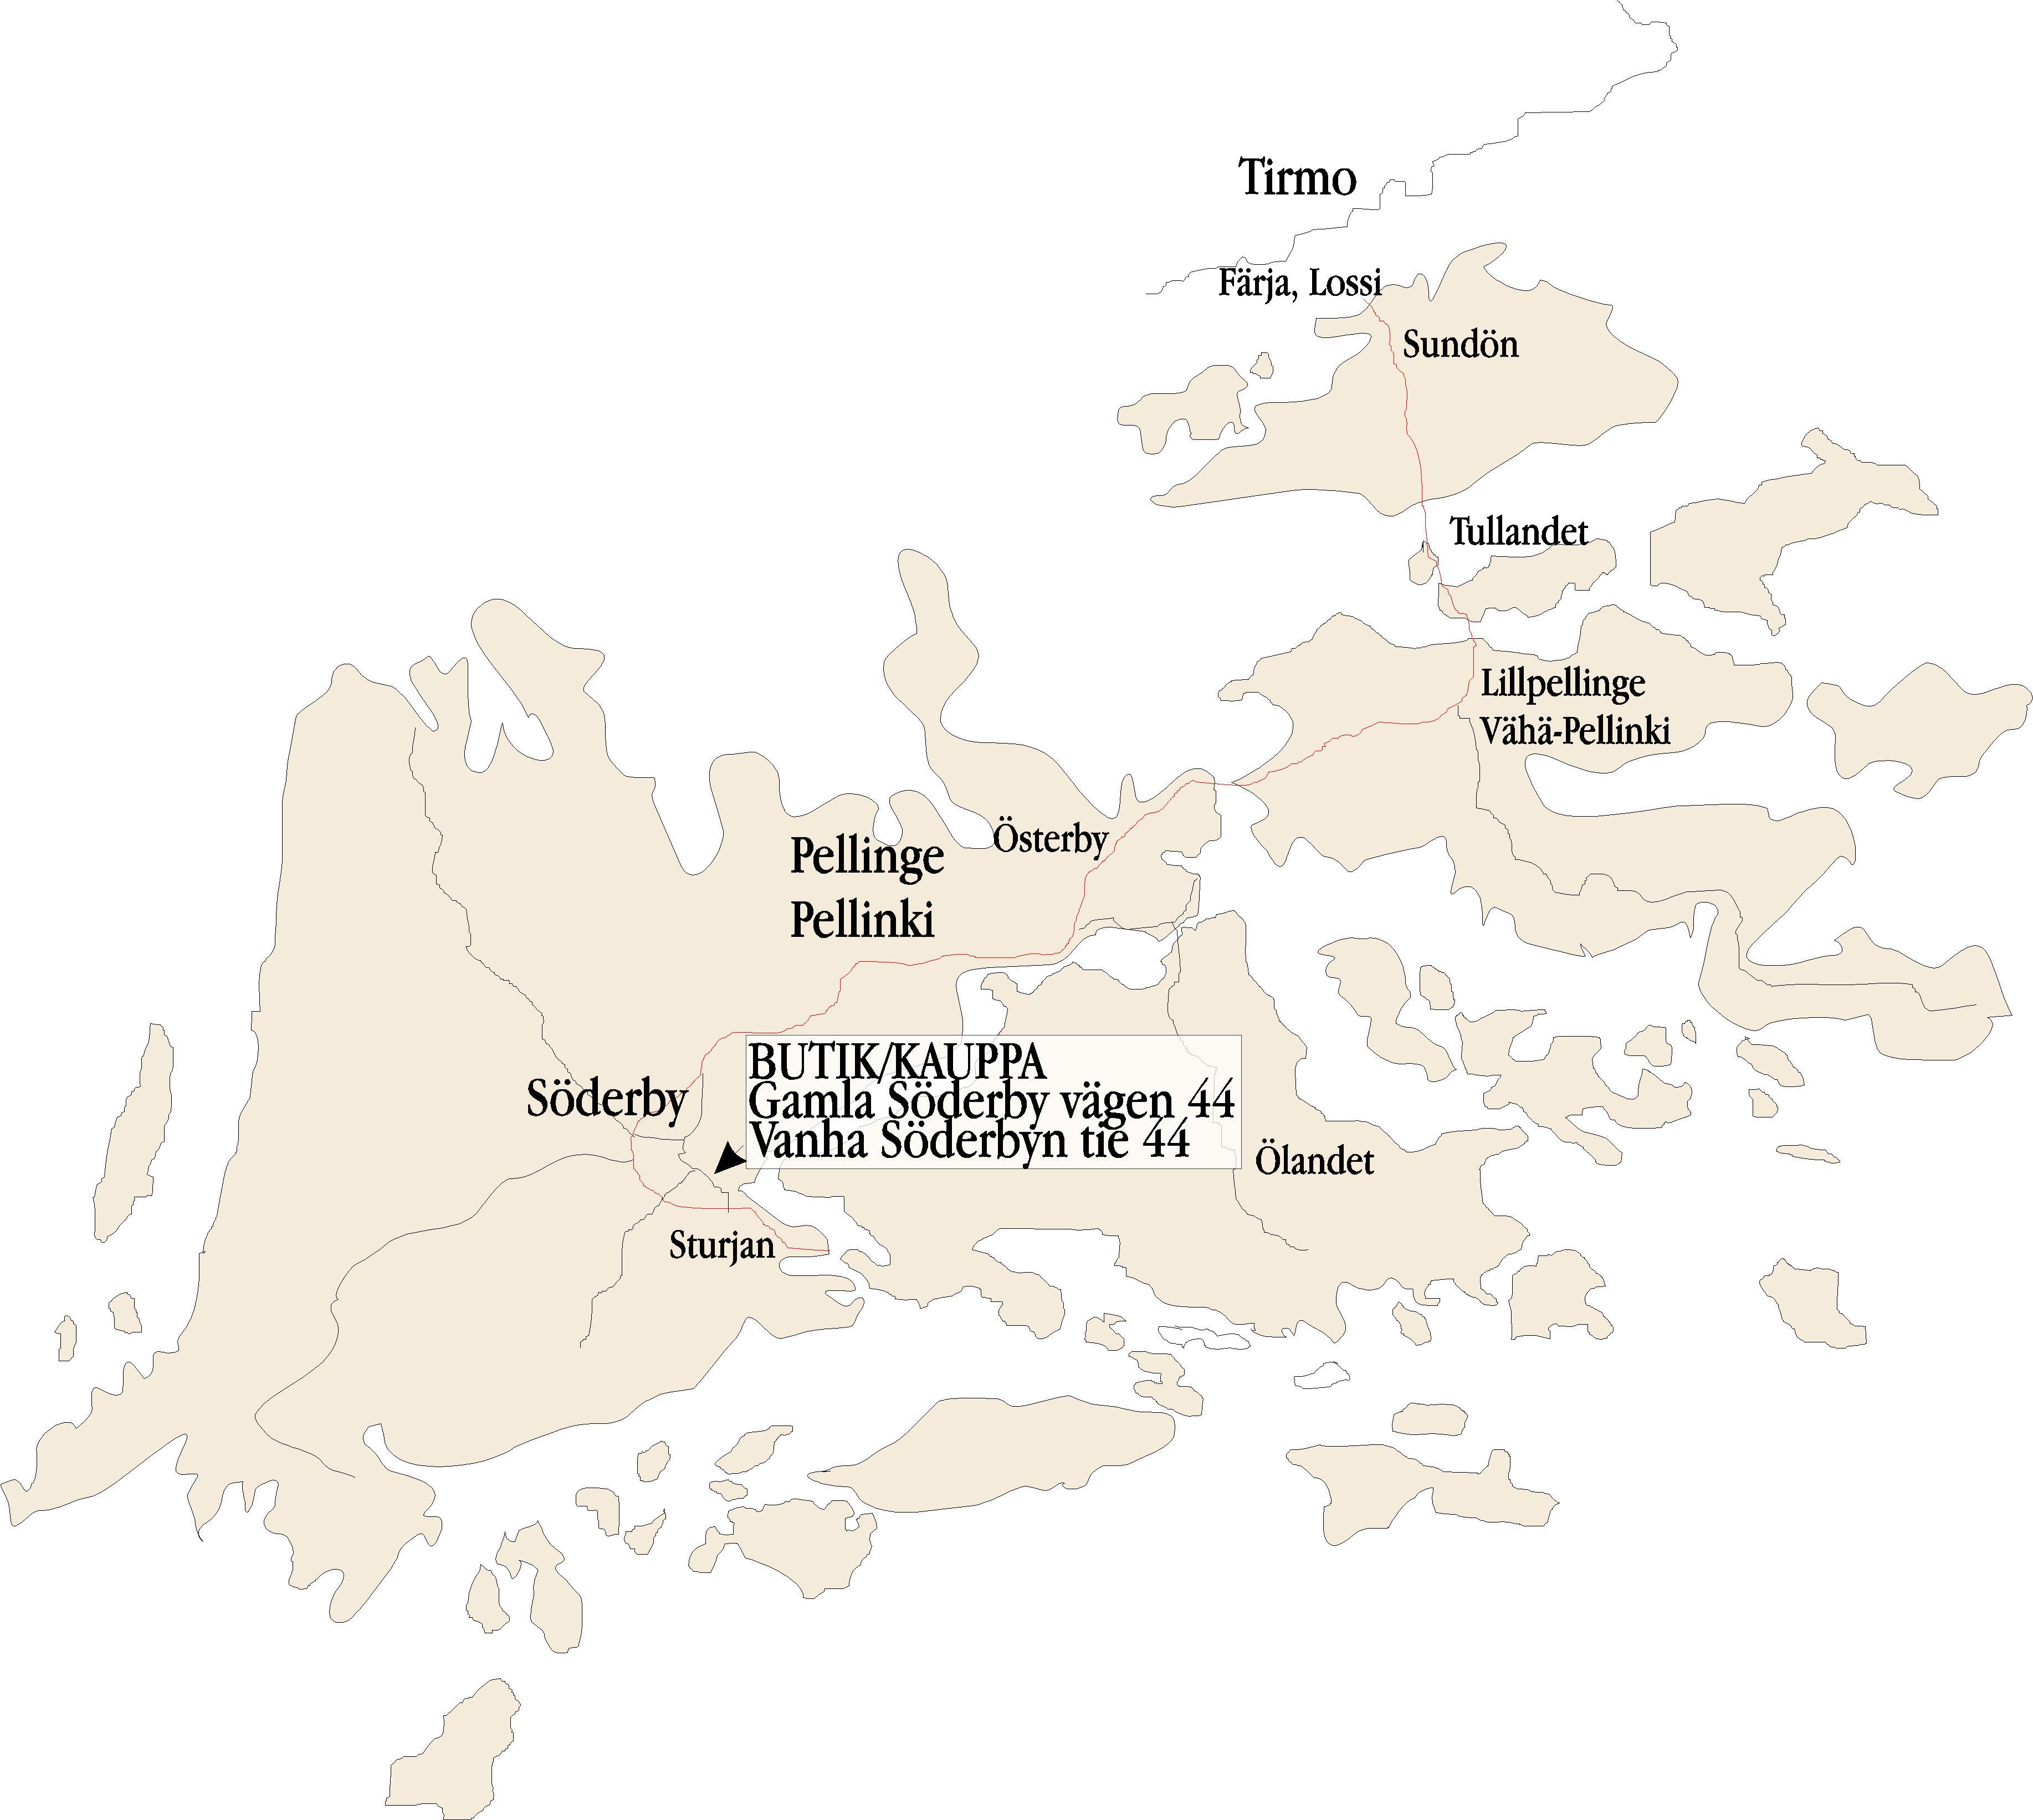 Karta Kartta Soderby Boden